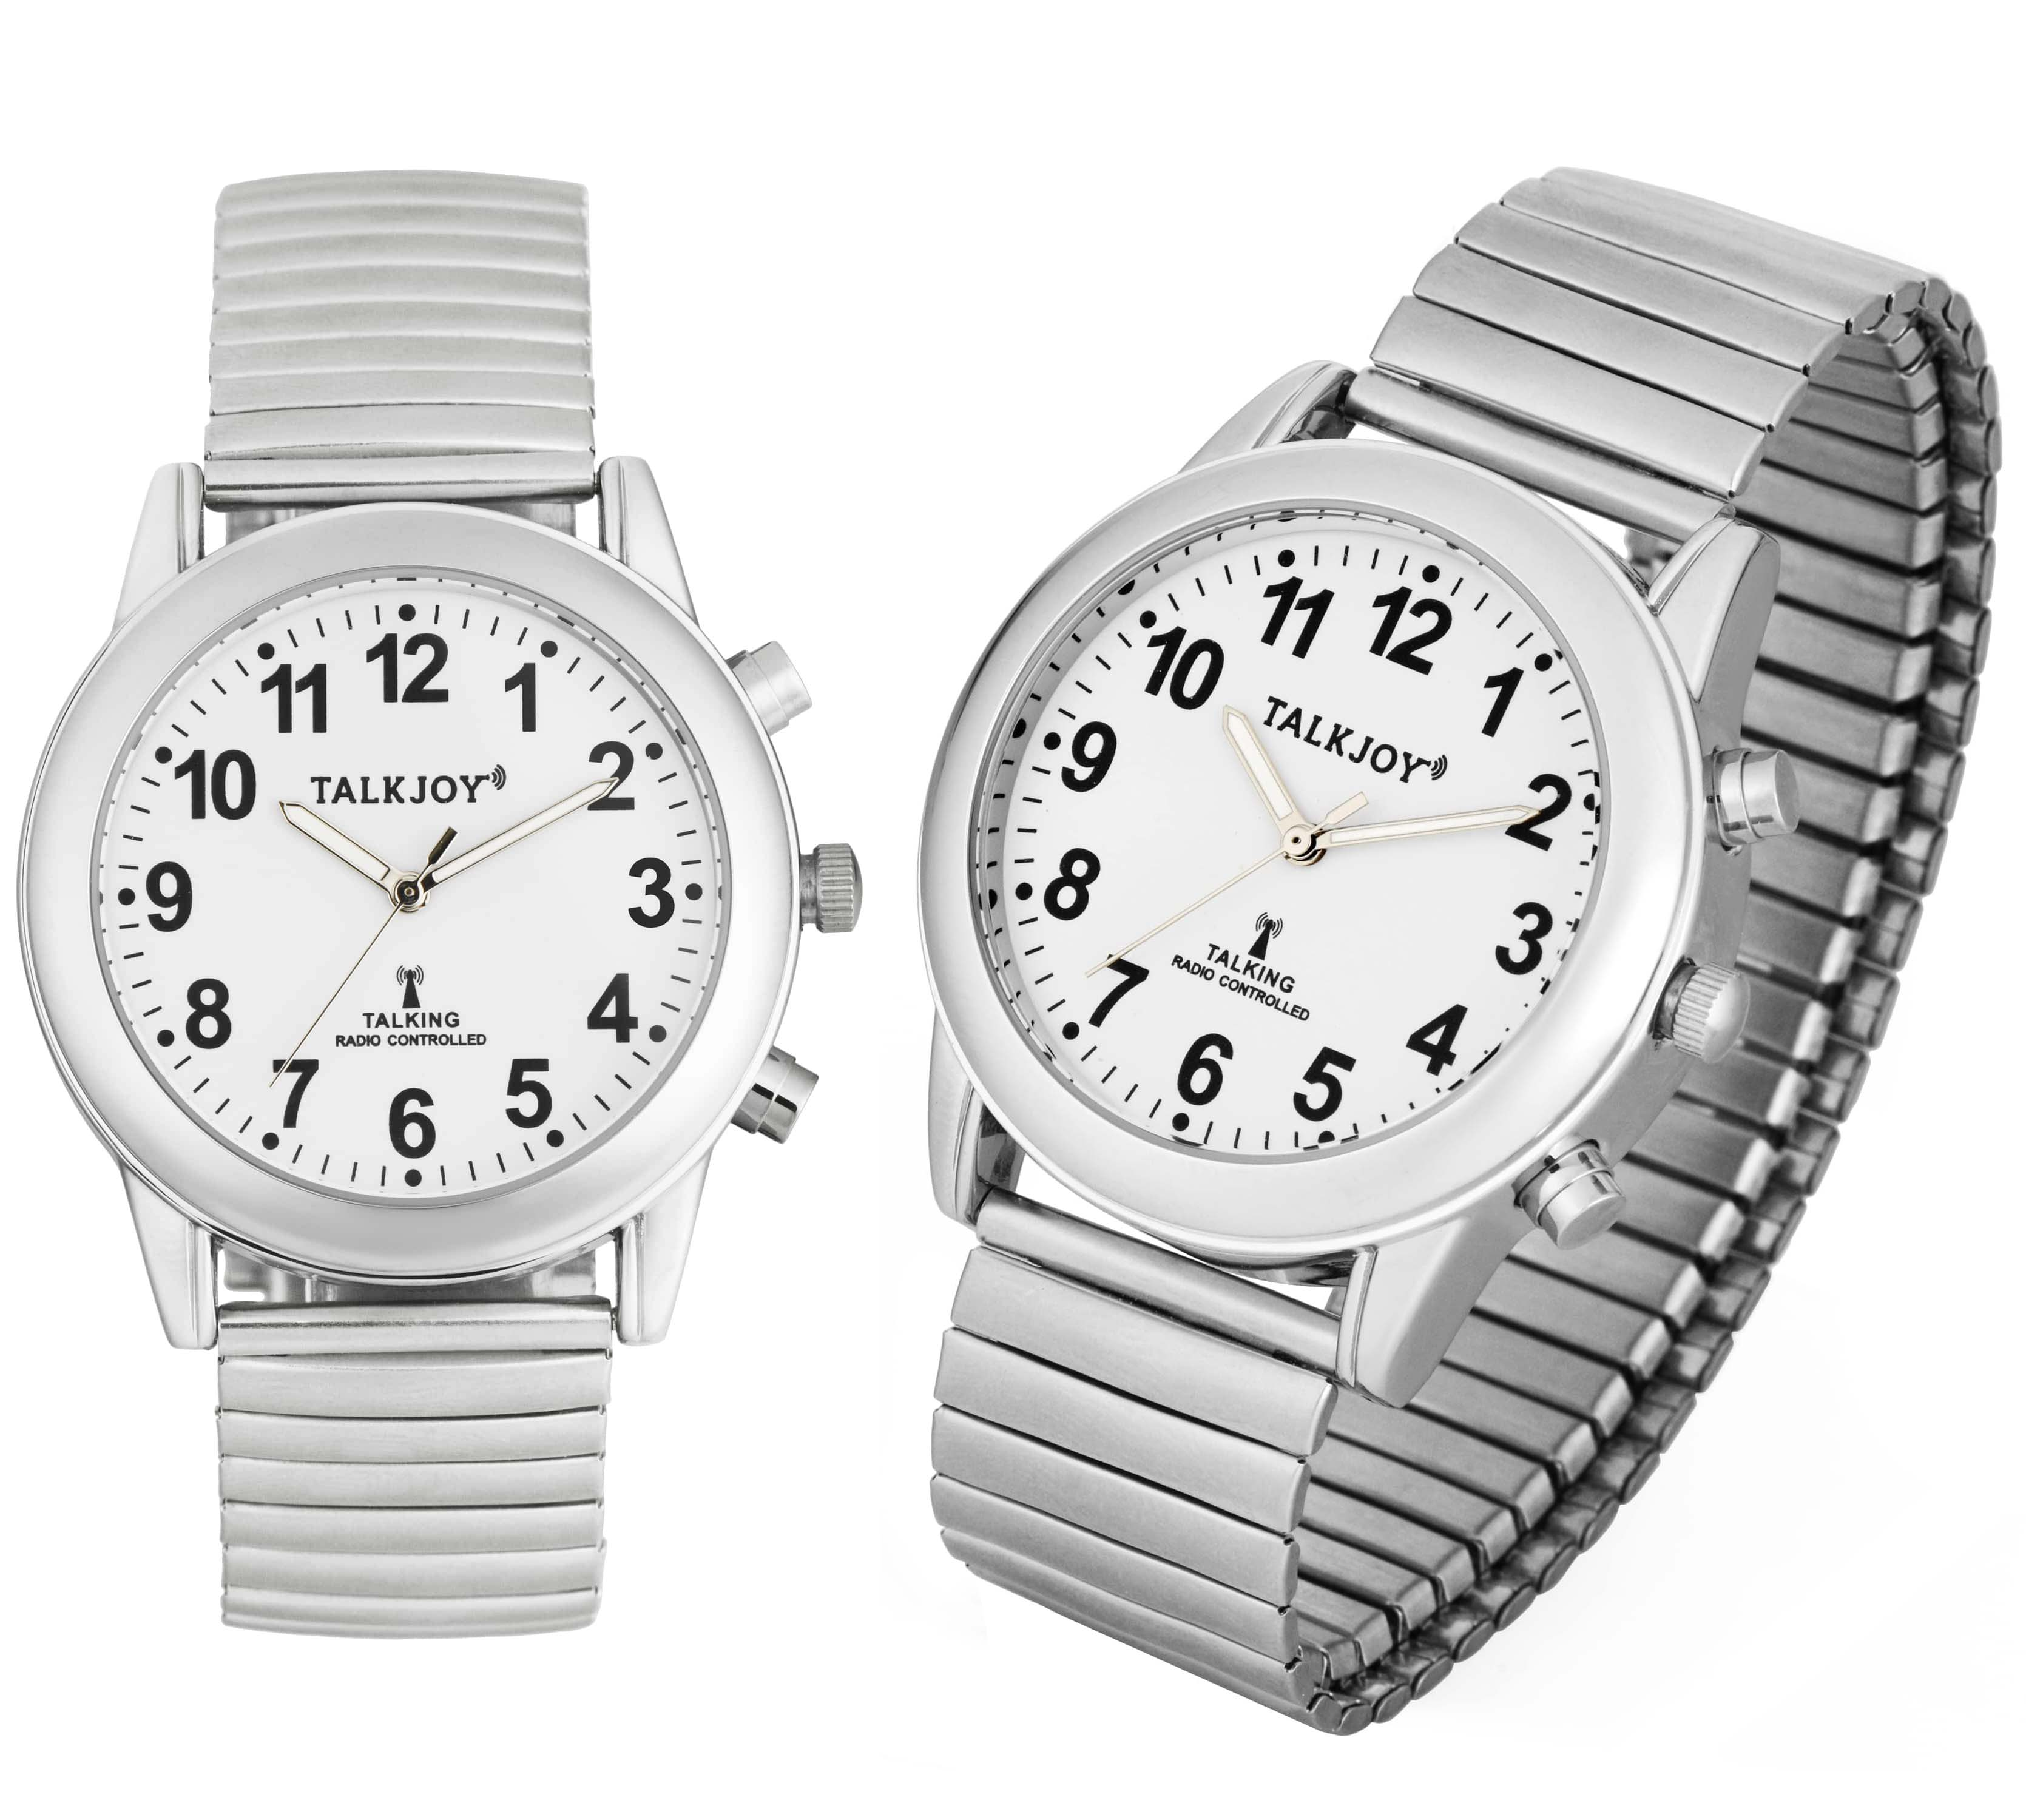 FUNKUHR Damen Sprechende Armbanduhr Uhr Funkarmbanduhr SILBER Blindenuhr Datum